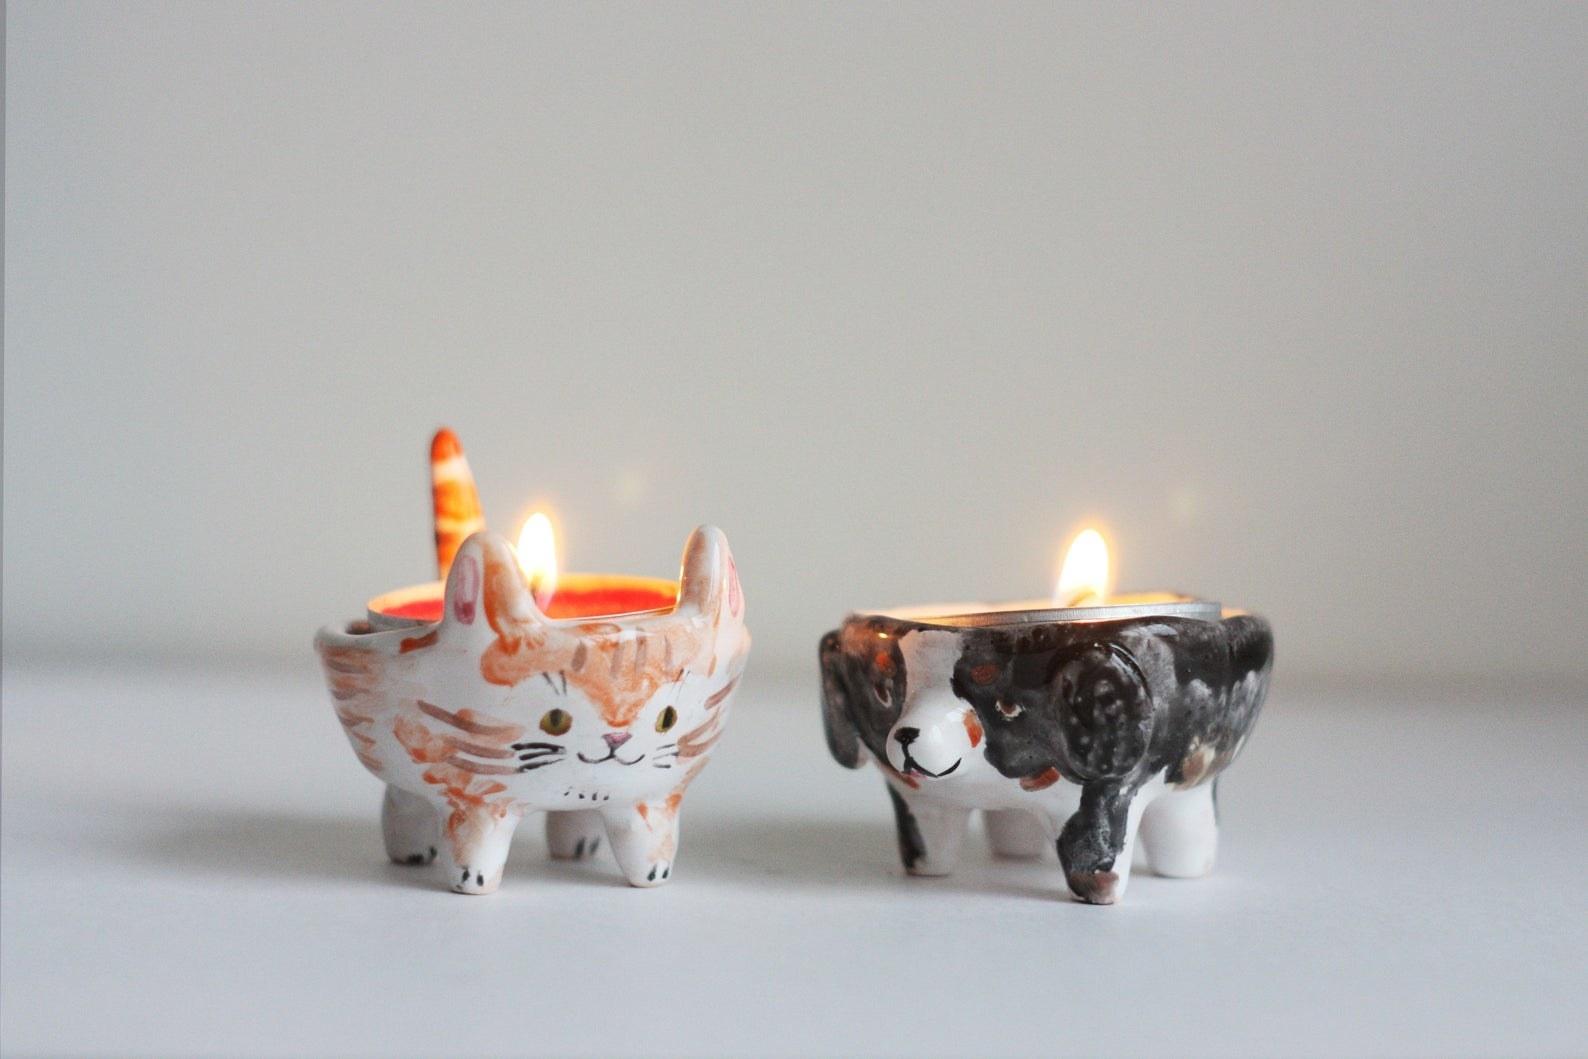 A dog and cat tea light holder with lit tea lights